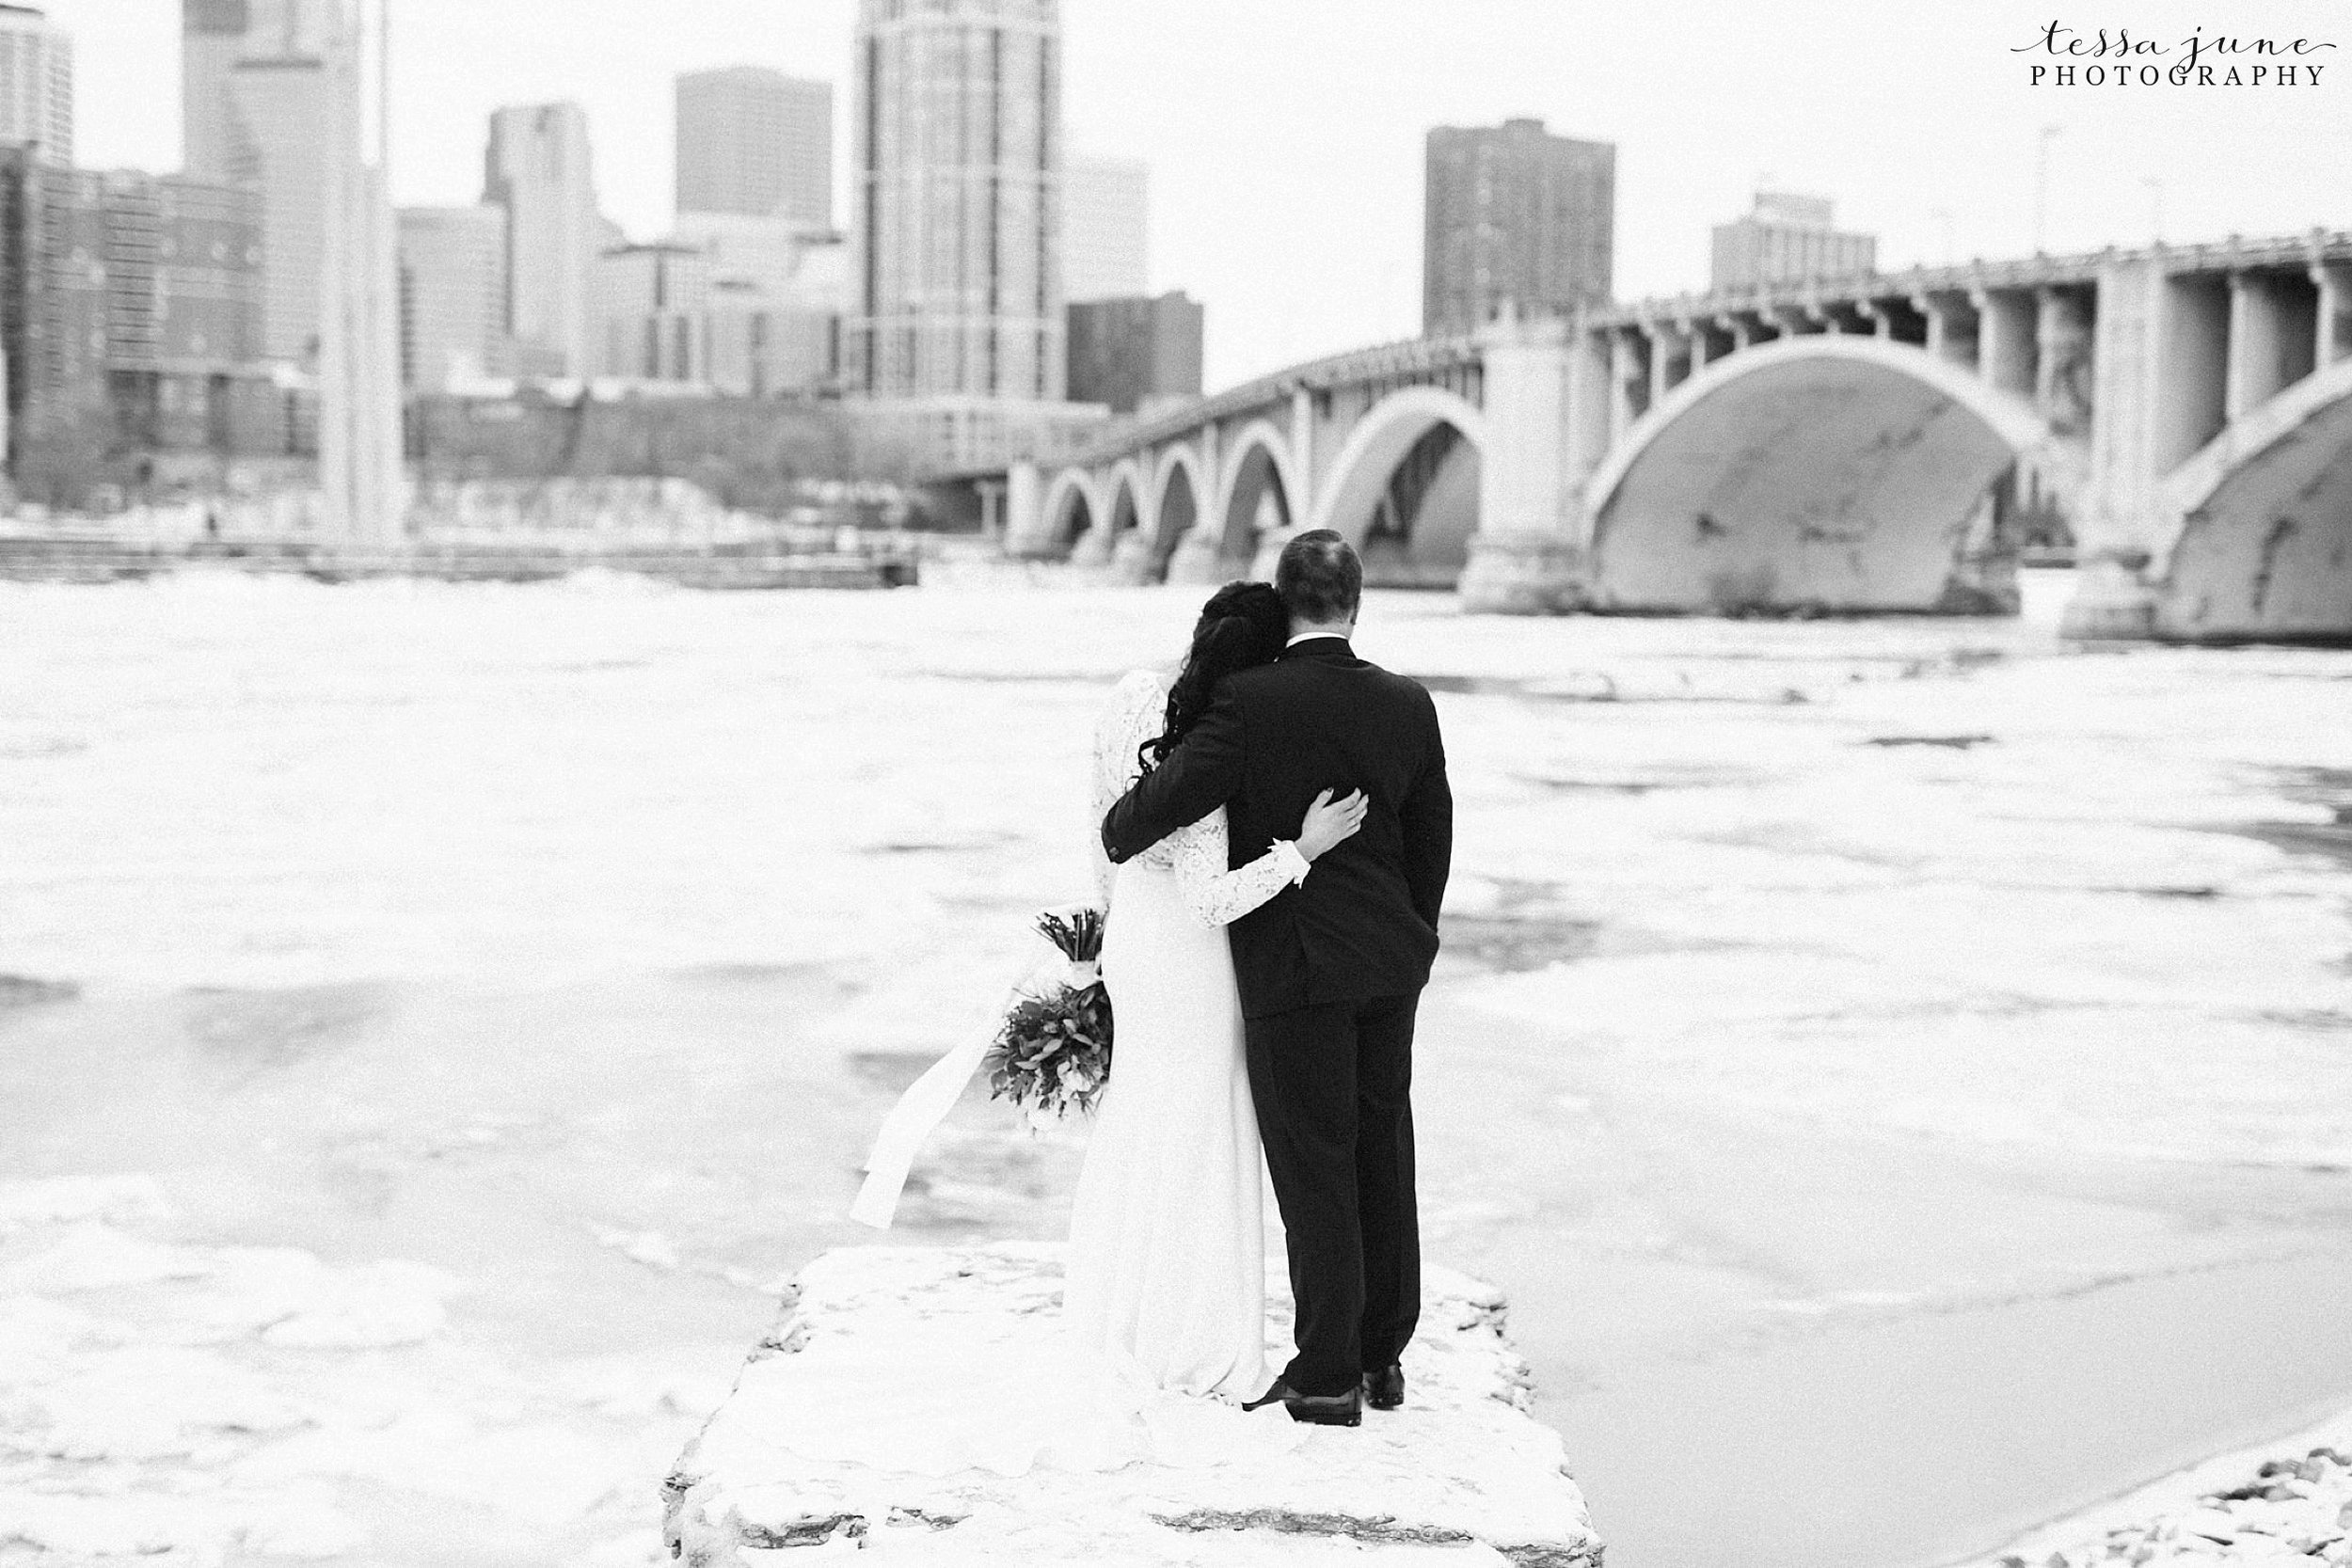 minneapolis-event-center-winter-romantic-snow-wedding-december-103.jpg